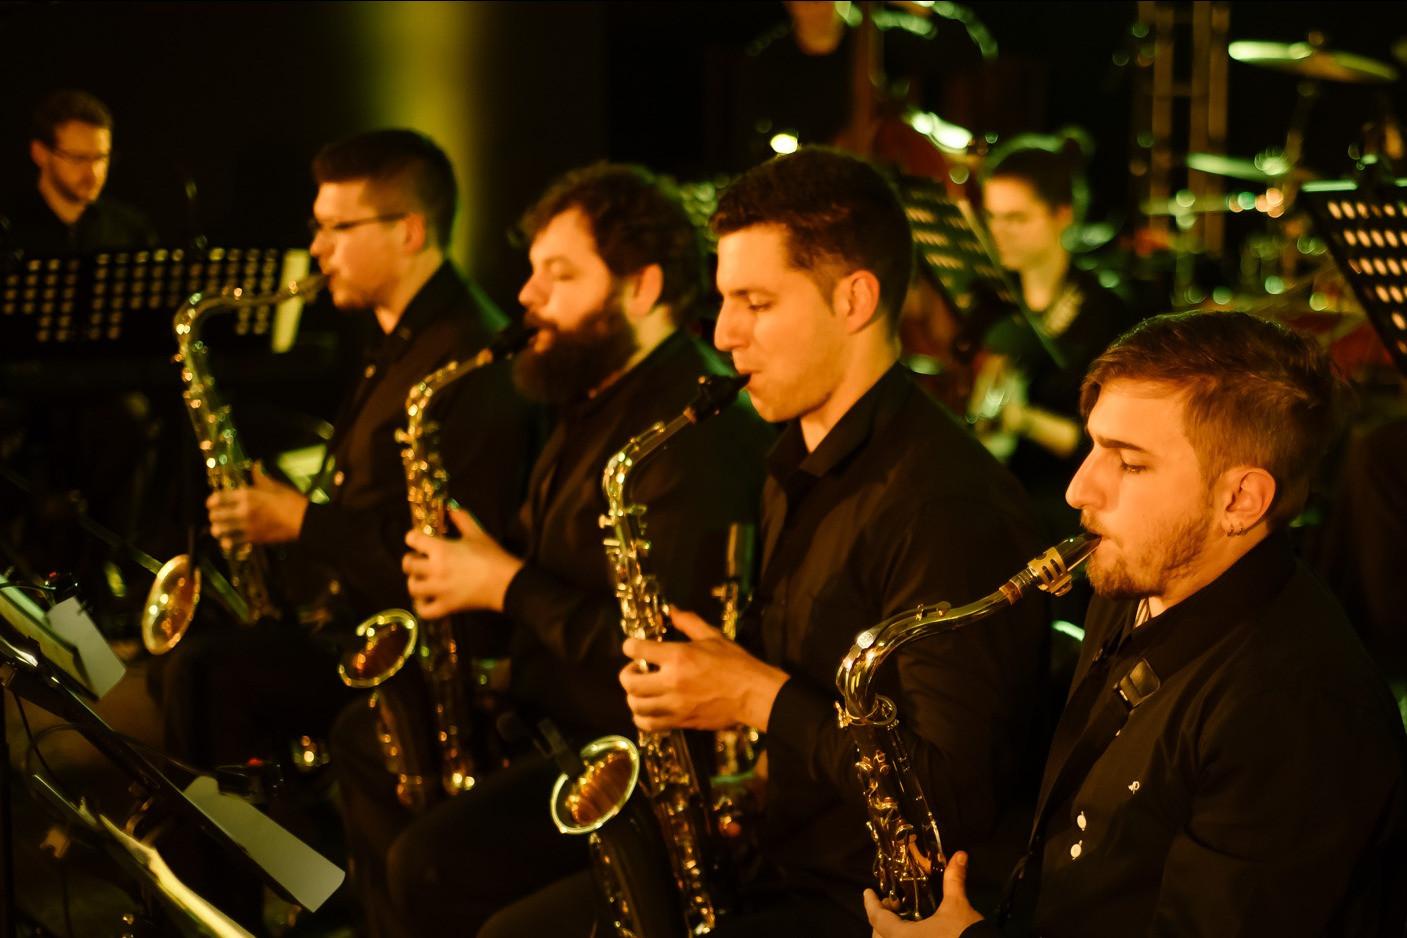 Foto Orquestra de Garibaldi realiza concerto em reverência a Elis Regina